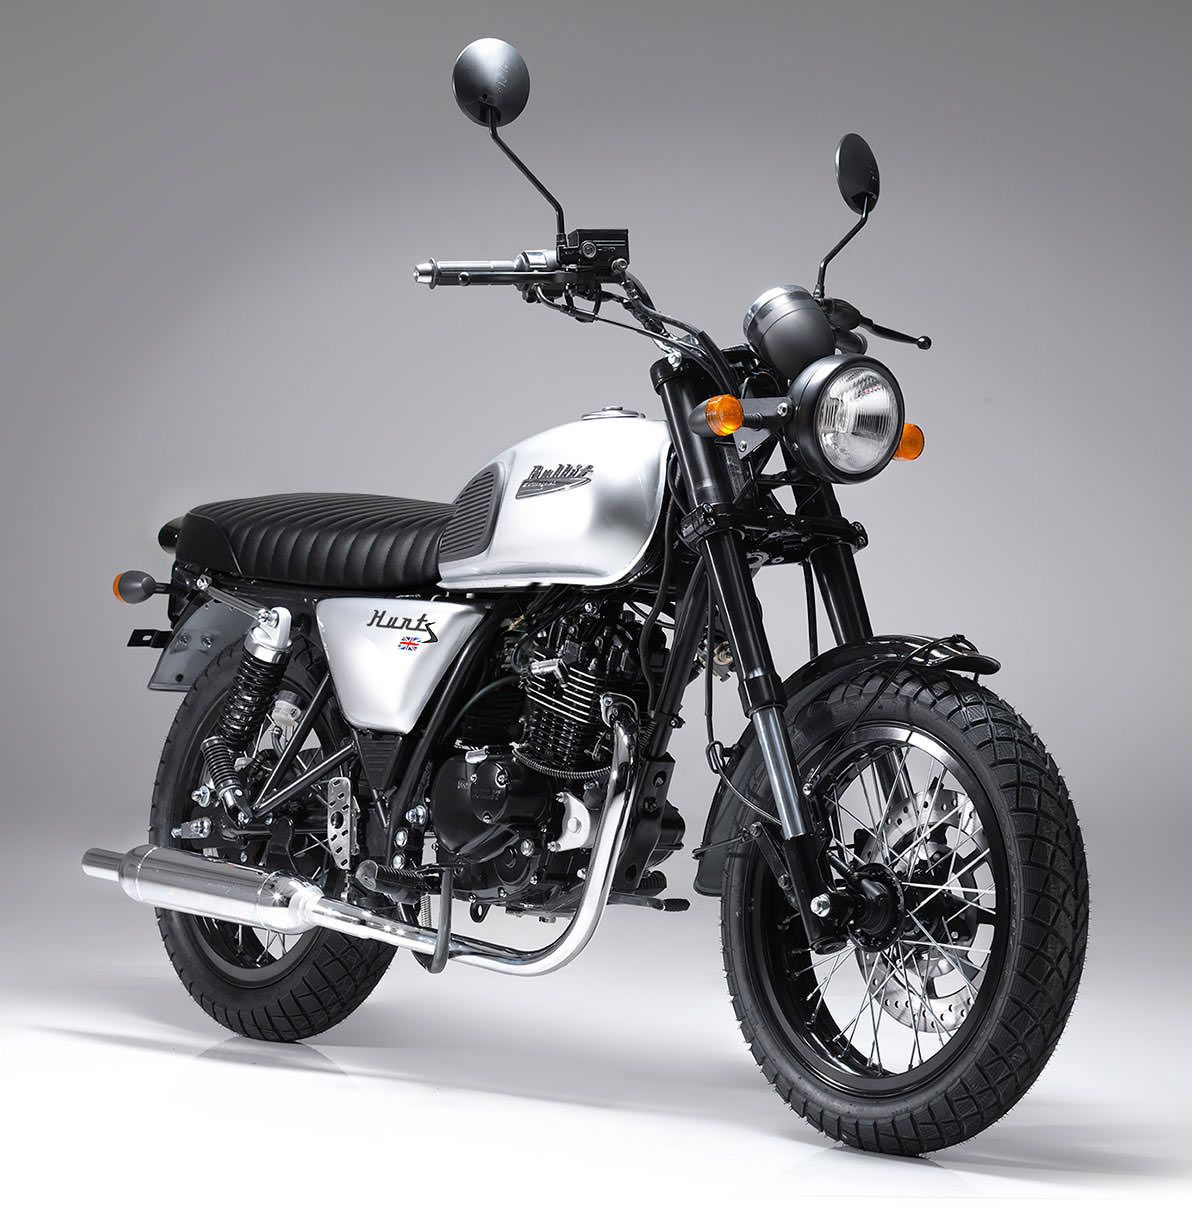 bullit hunt s 125 euro 4 et cbs pour 2017 dicana custom motorcycles motorcycle y cars. Black Bedroom Furniture Sets. Home Design Ideas